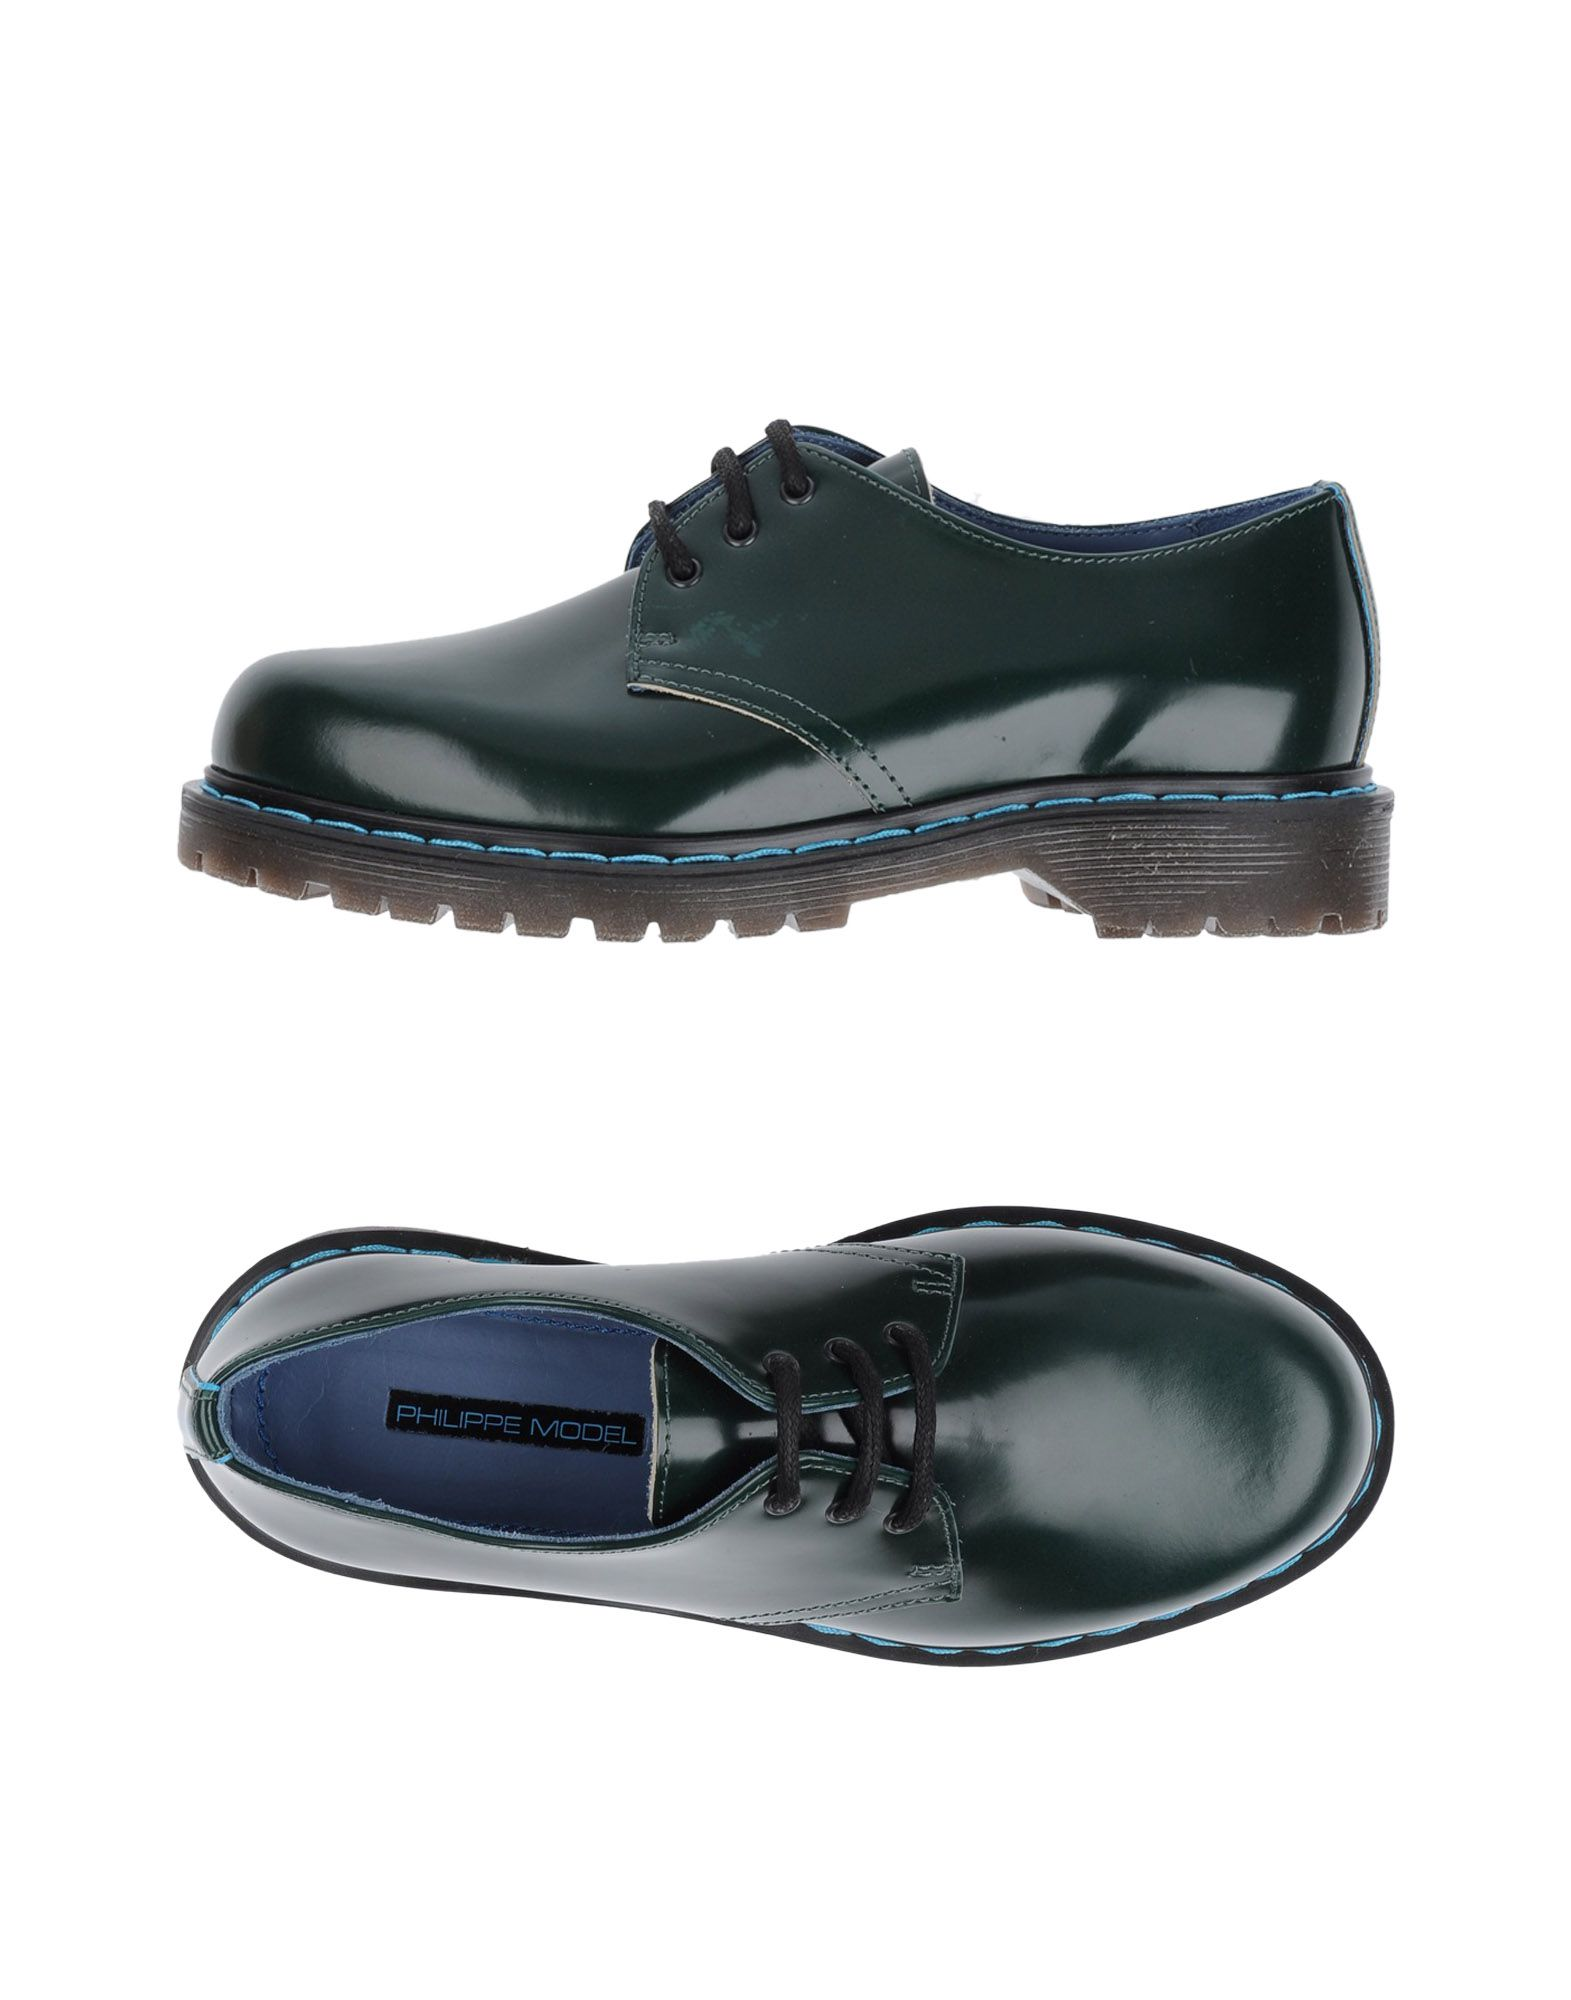 Philippe Model Schnürschuhe Damen  11259044II Gute Qualität beliebte Schuhe